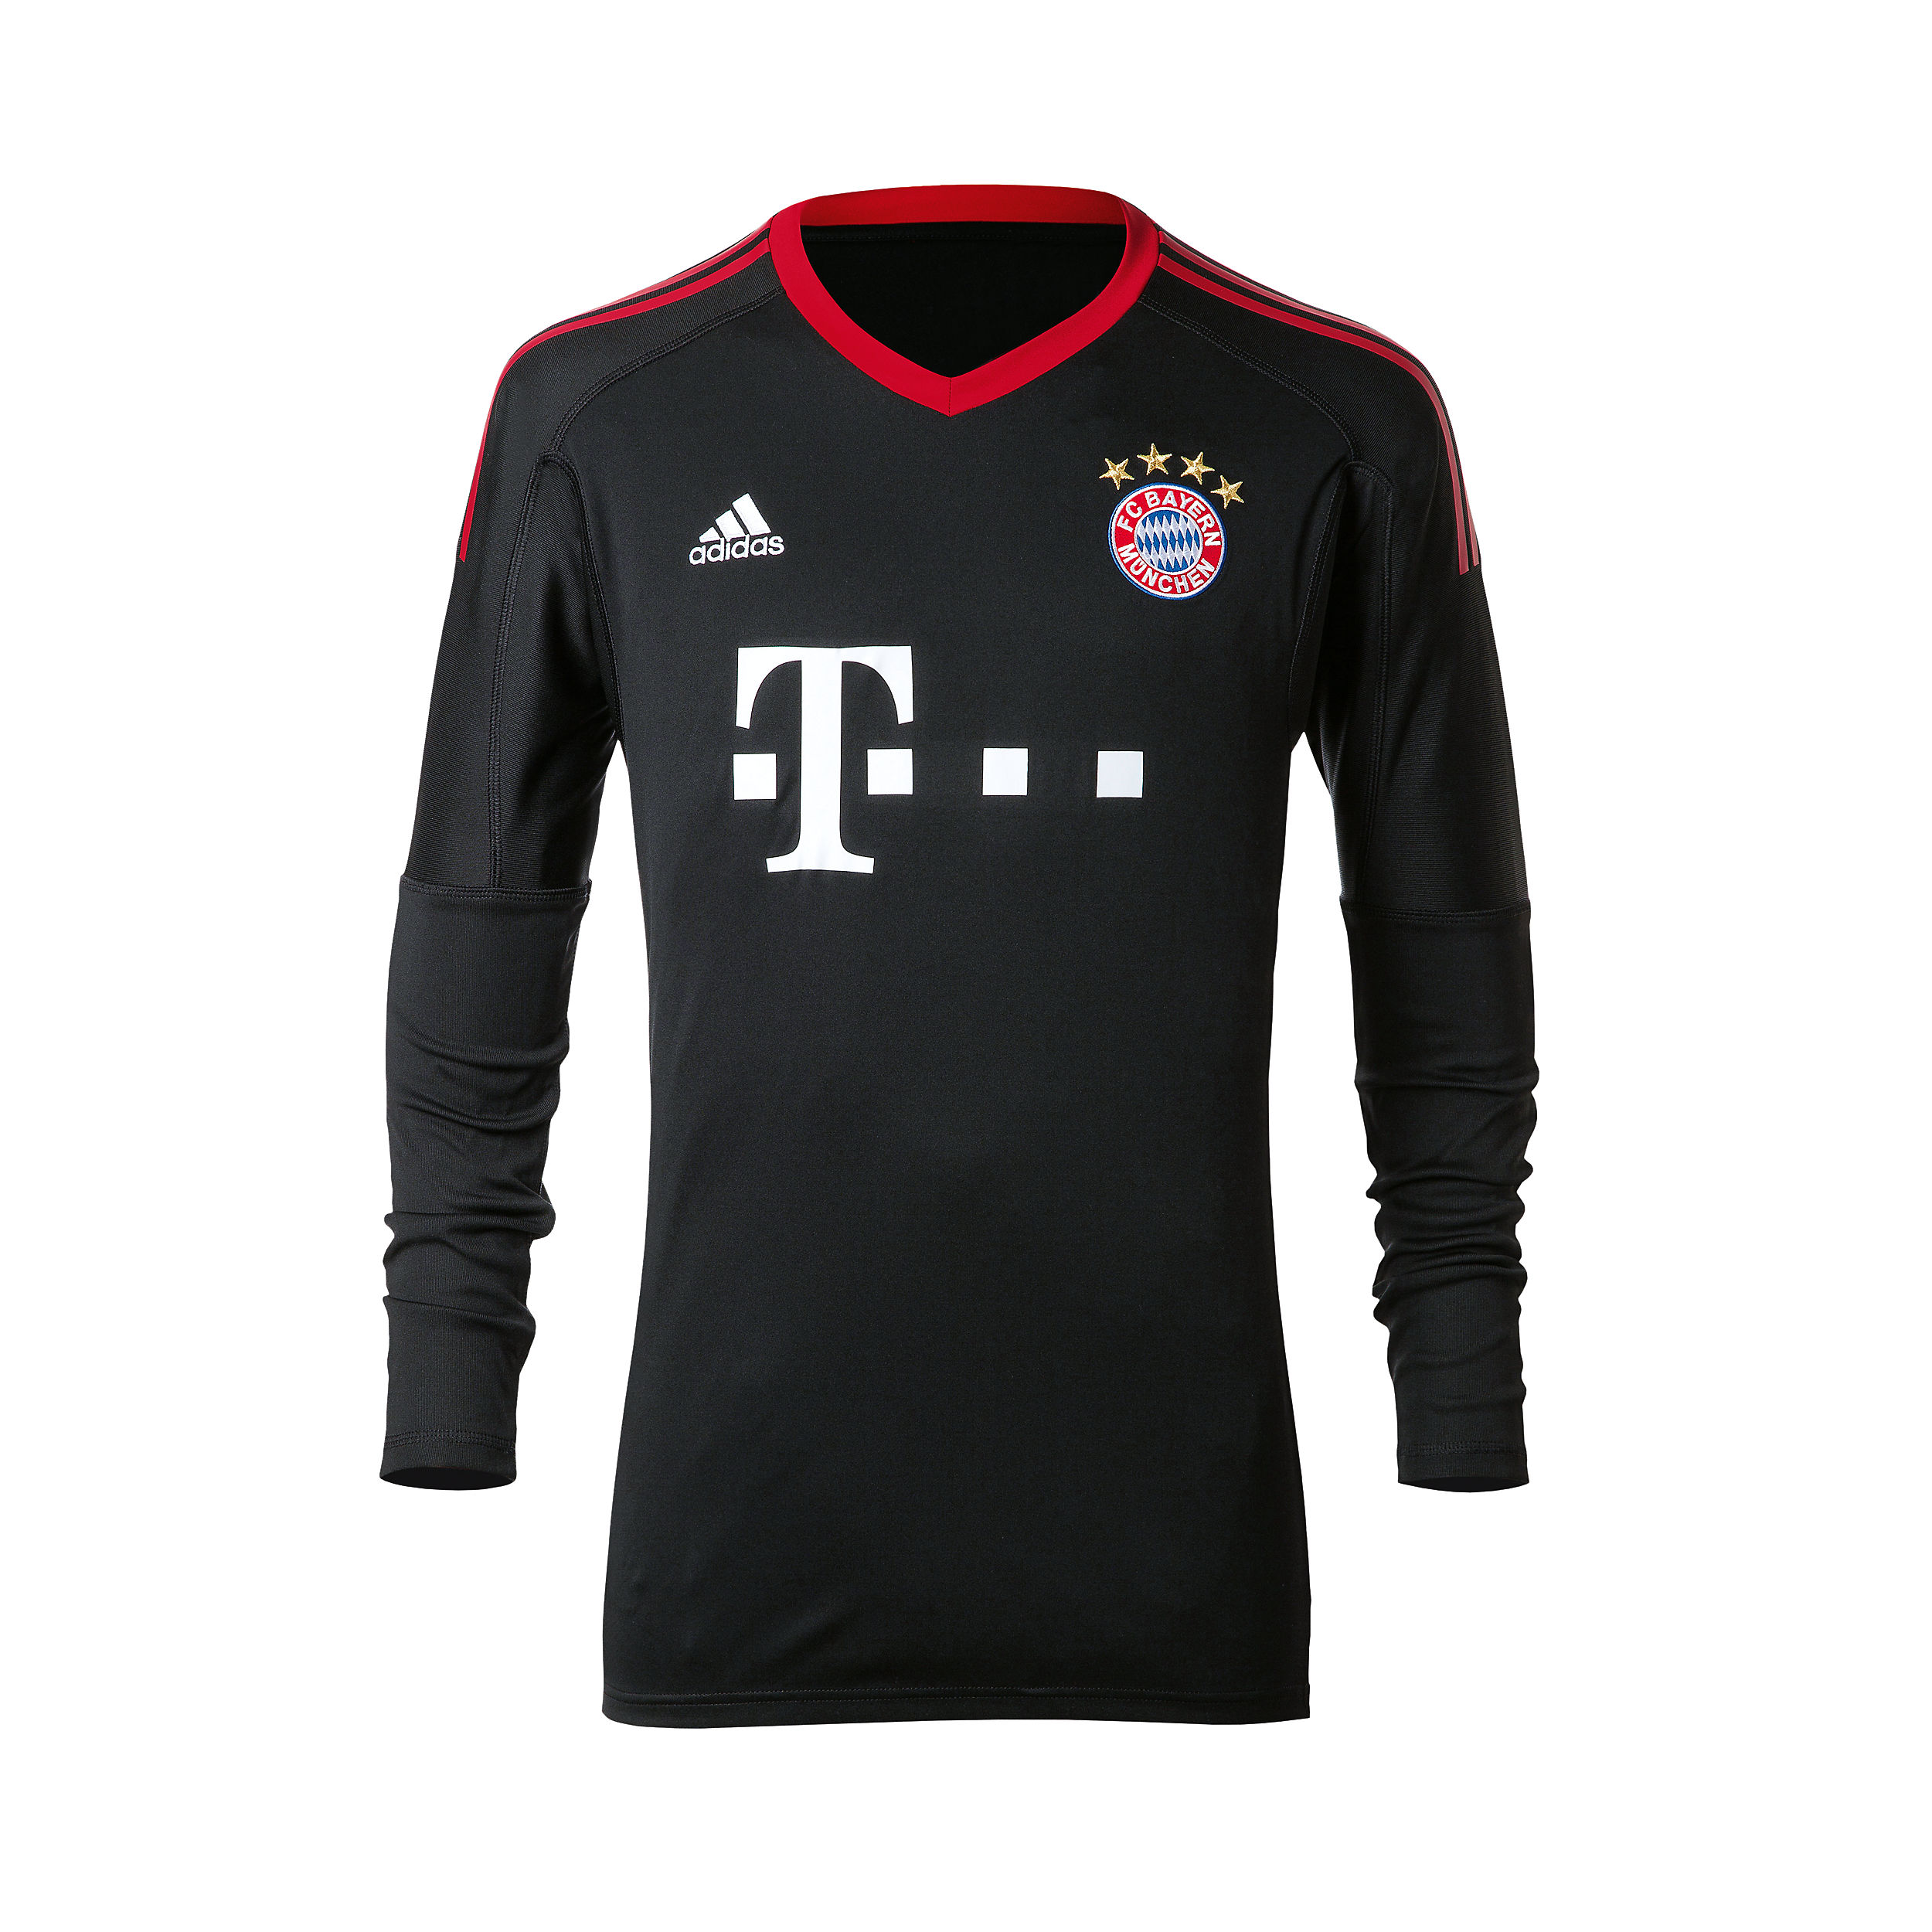 fc bayern kids jersey goalkeeper 17 18